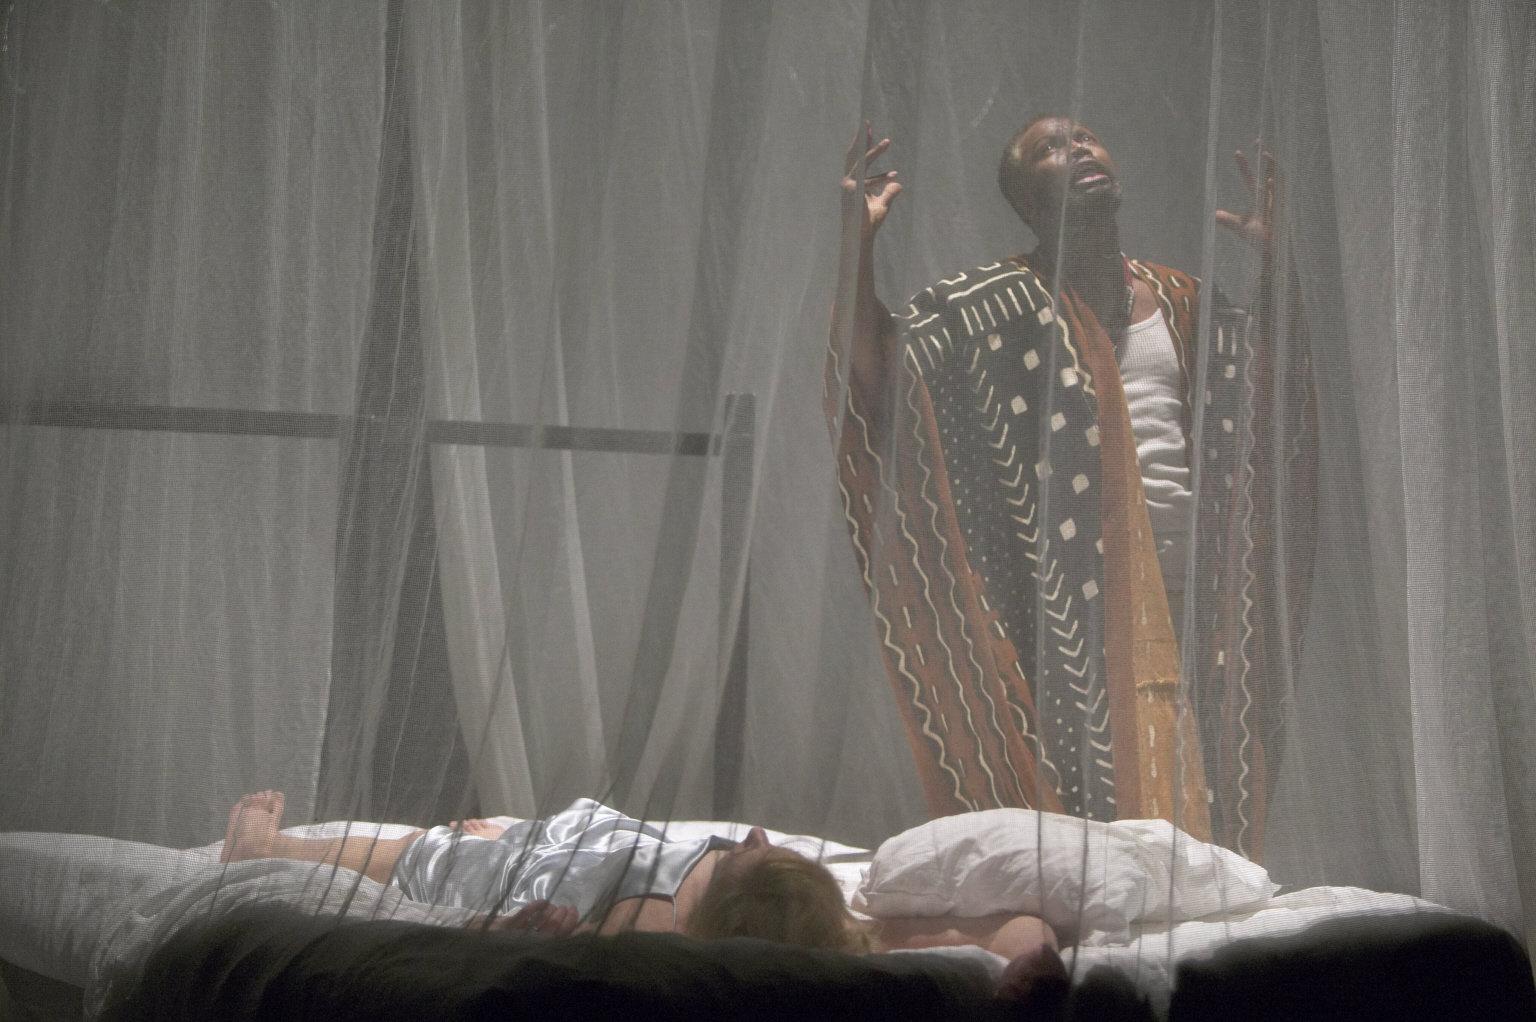 Othello stands over Desdemona's body.